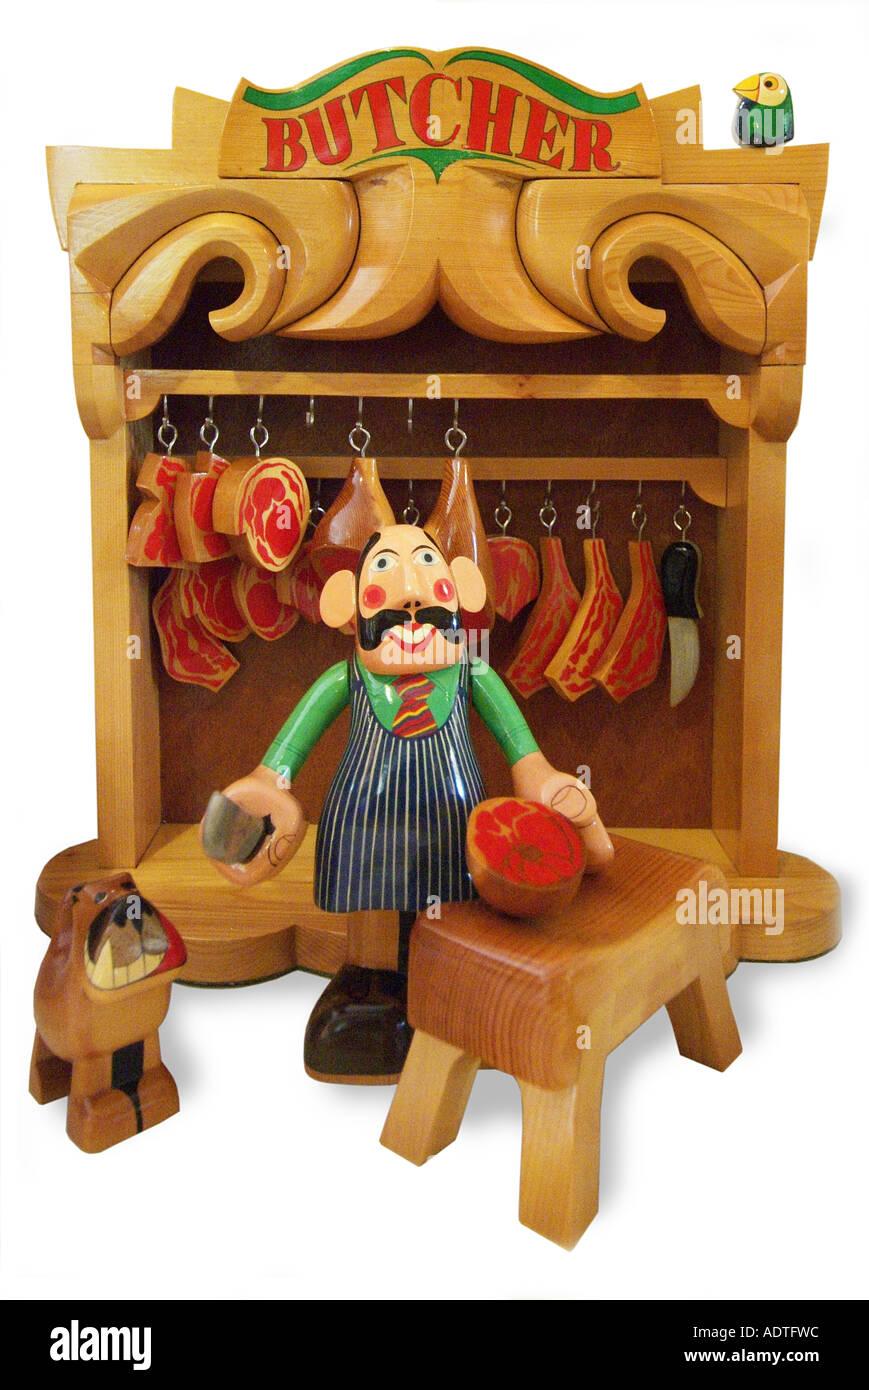 Toy wood wooden Butcher shop meat dog chopper cleaver block side ham beef leg England UK United Kingdom GB - Stock Image